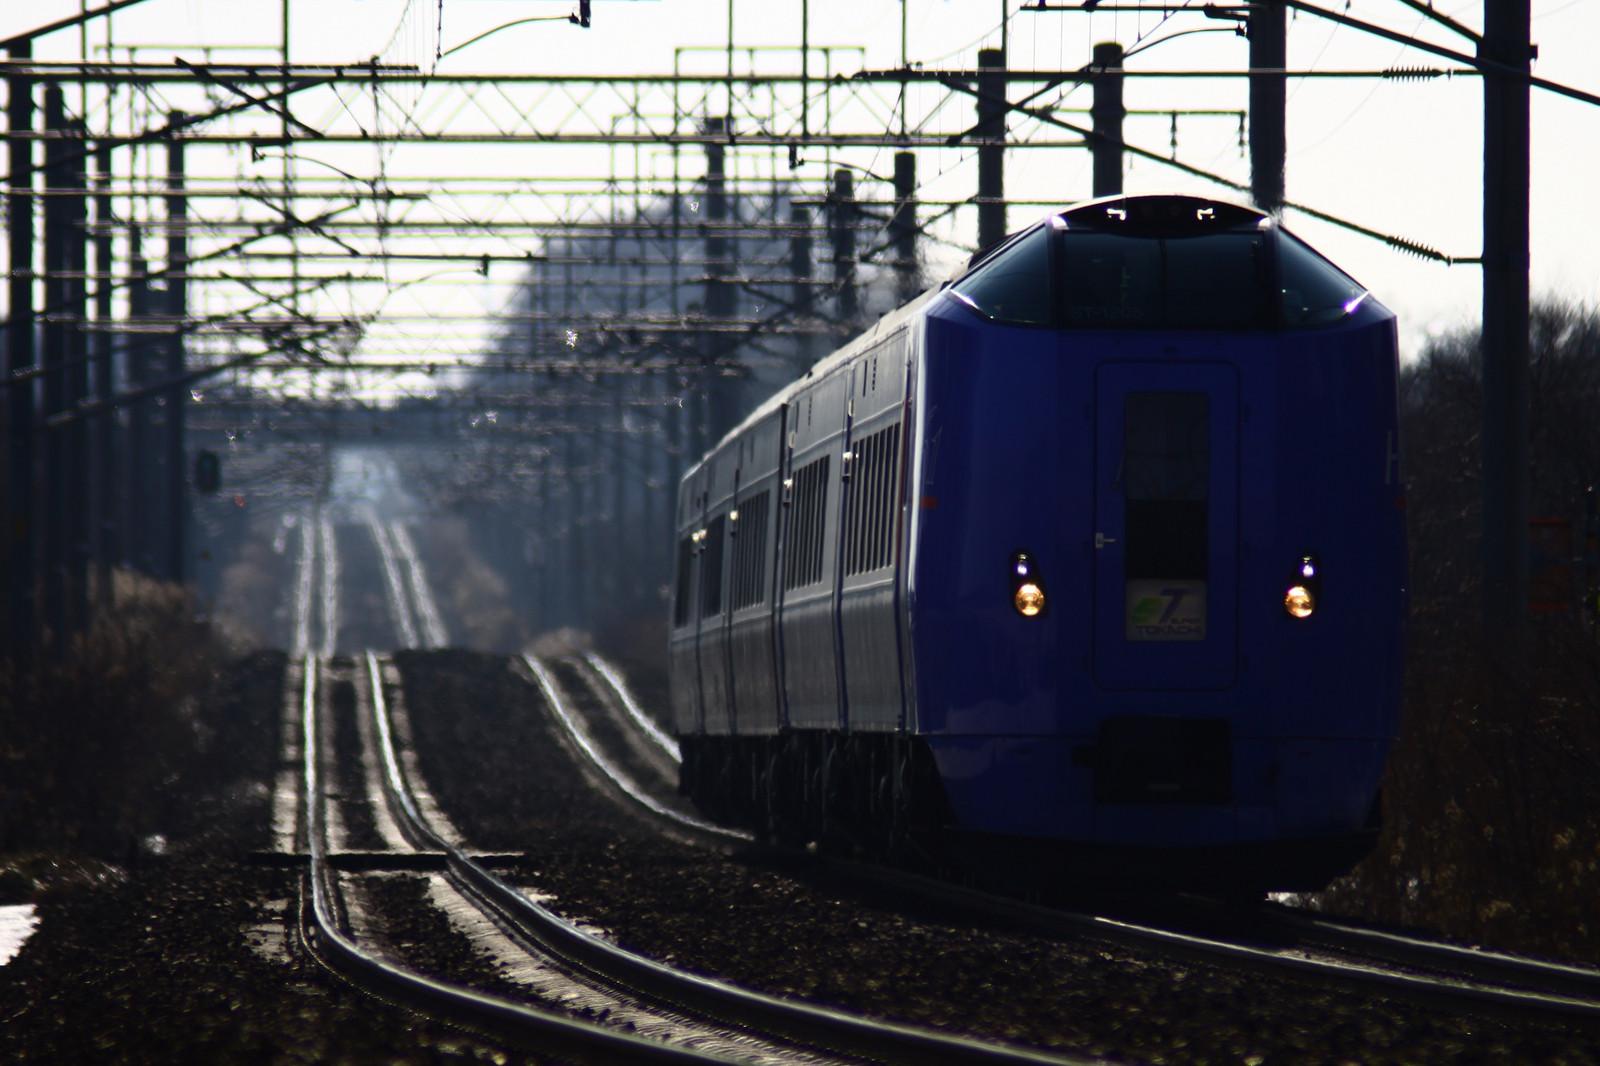 Jr1512125007